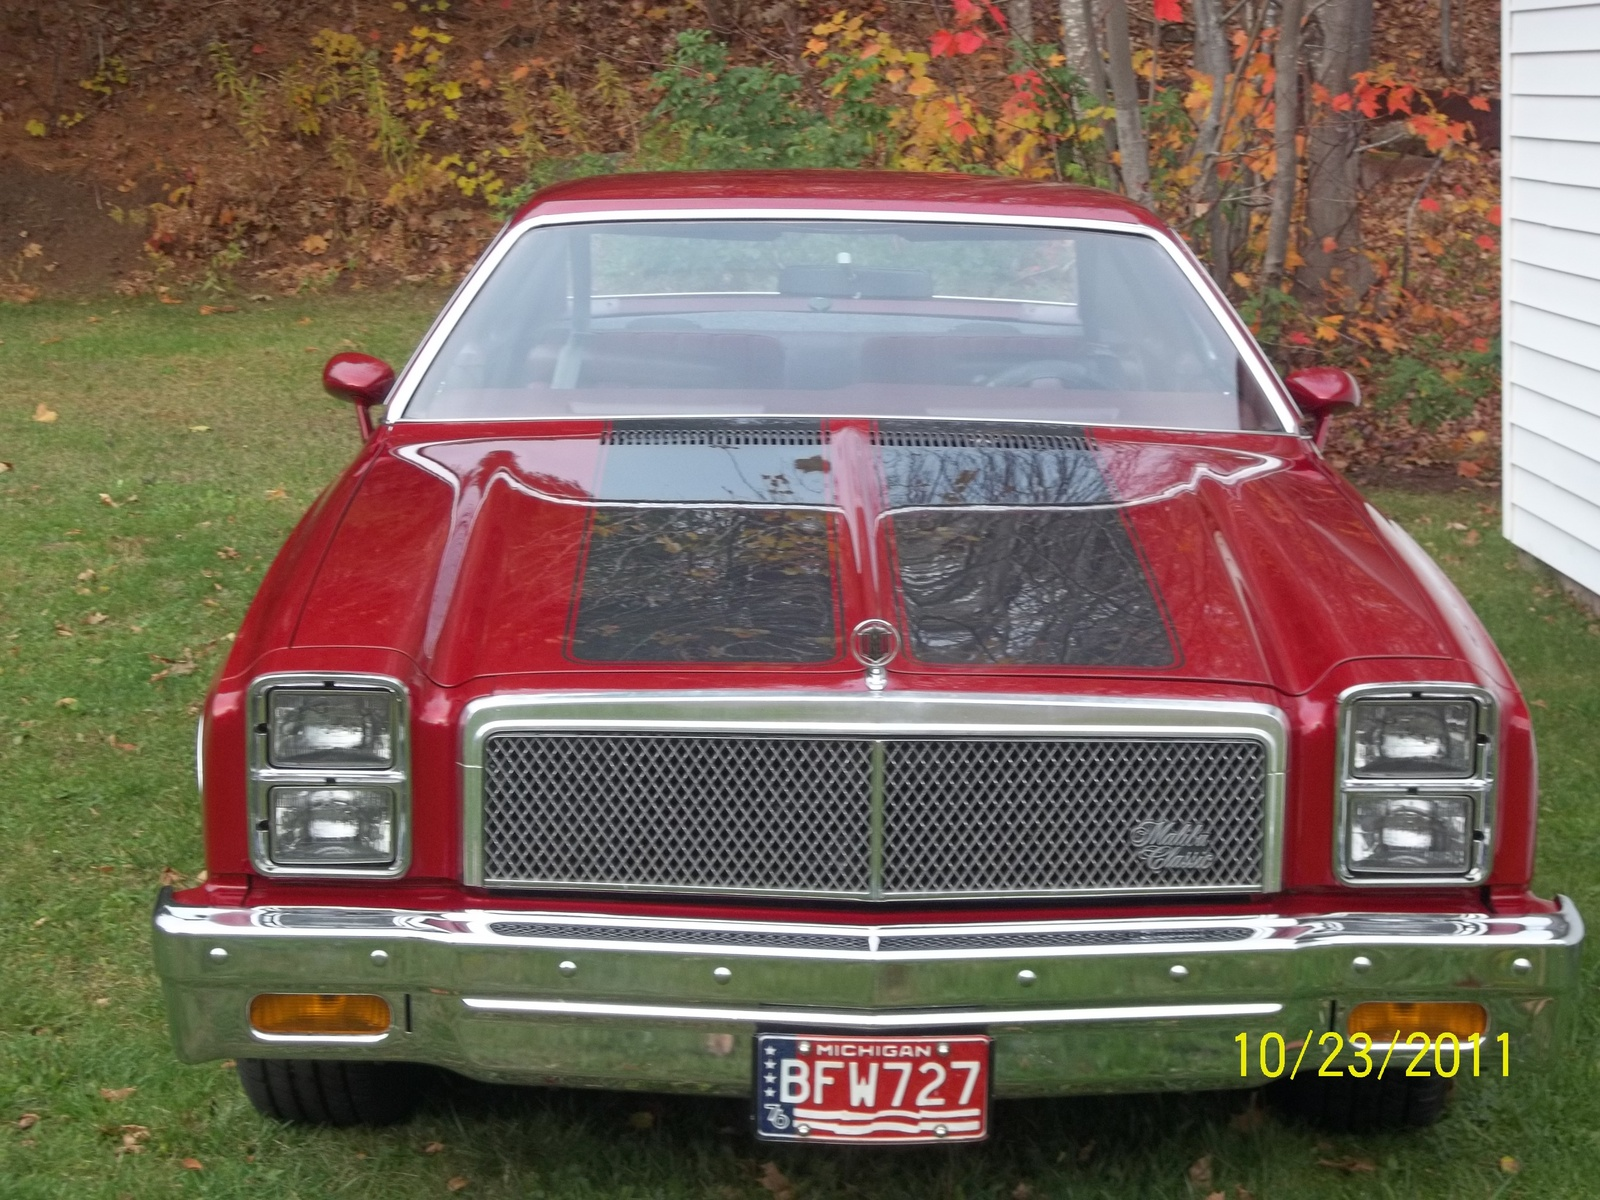 1976 Chevrolet Malibu, 76 Malibu Classic, exterior